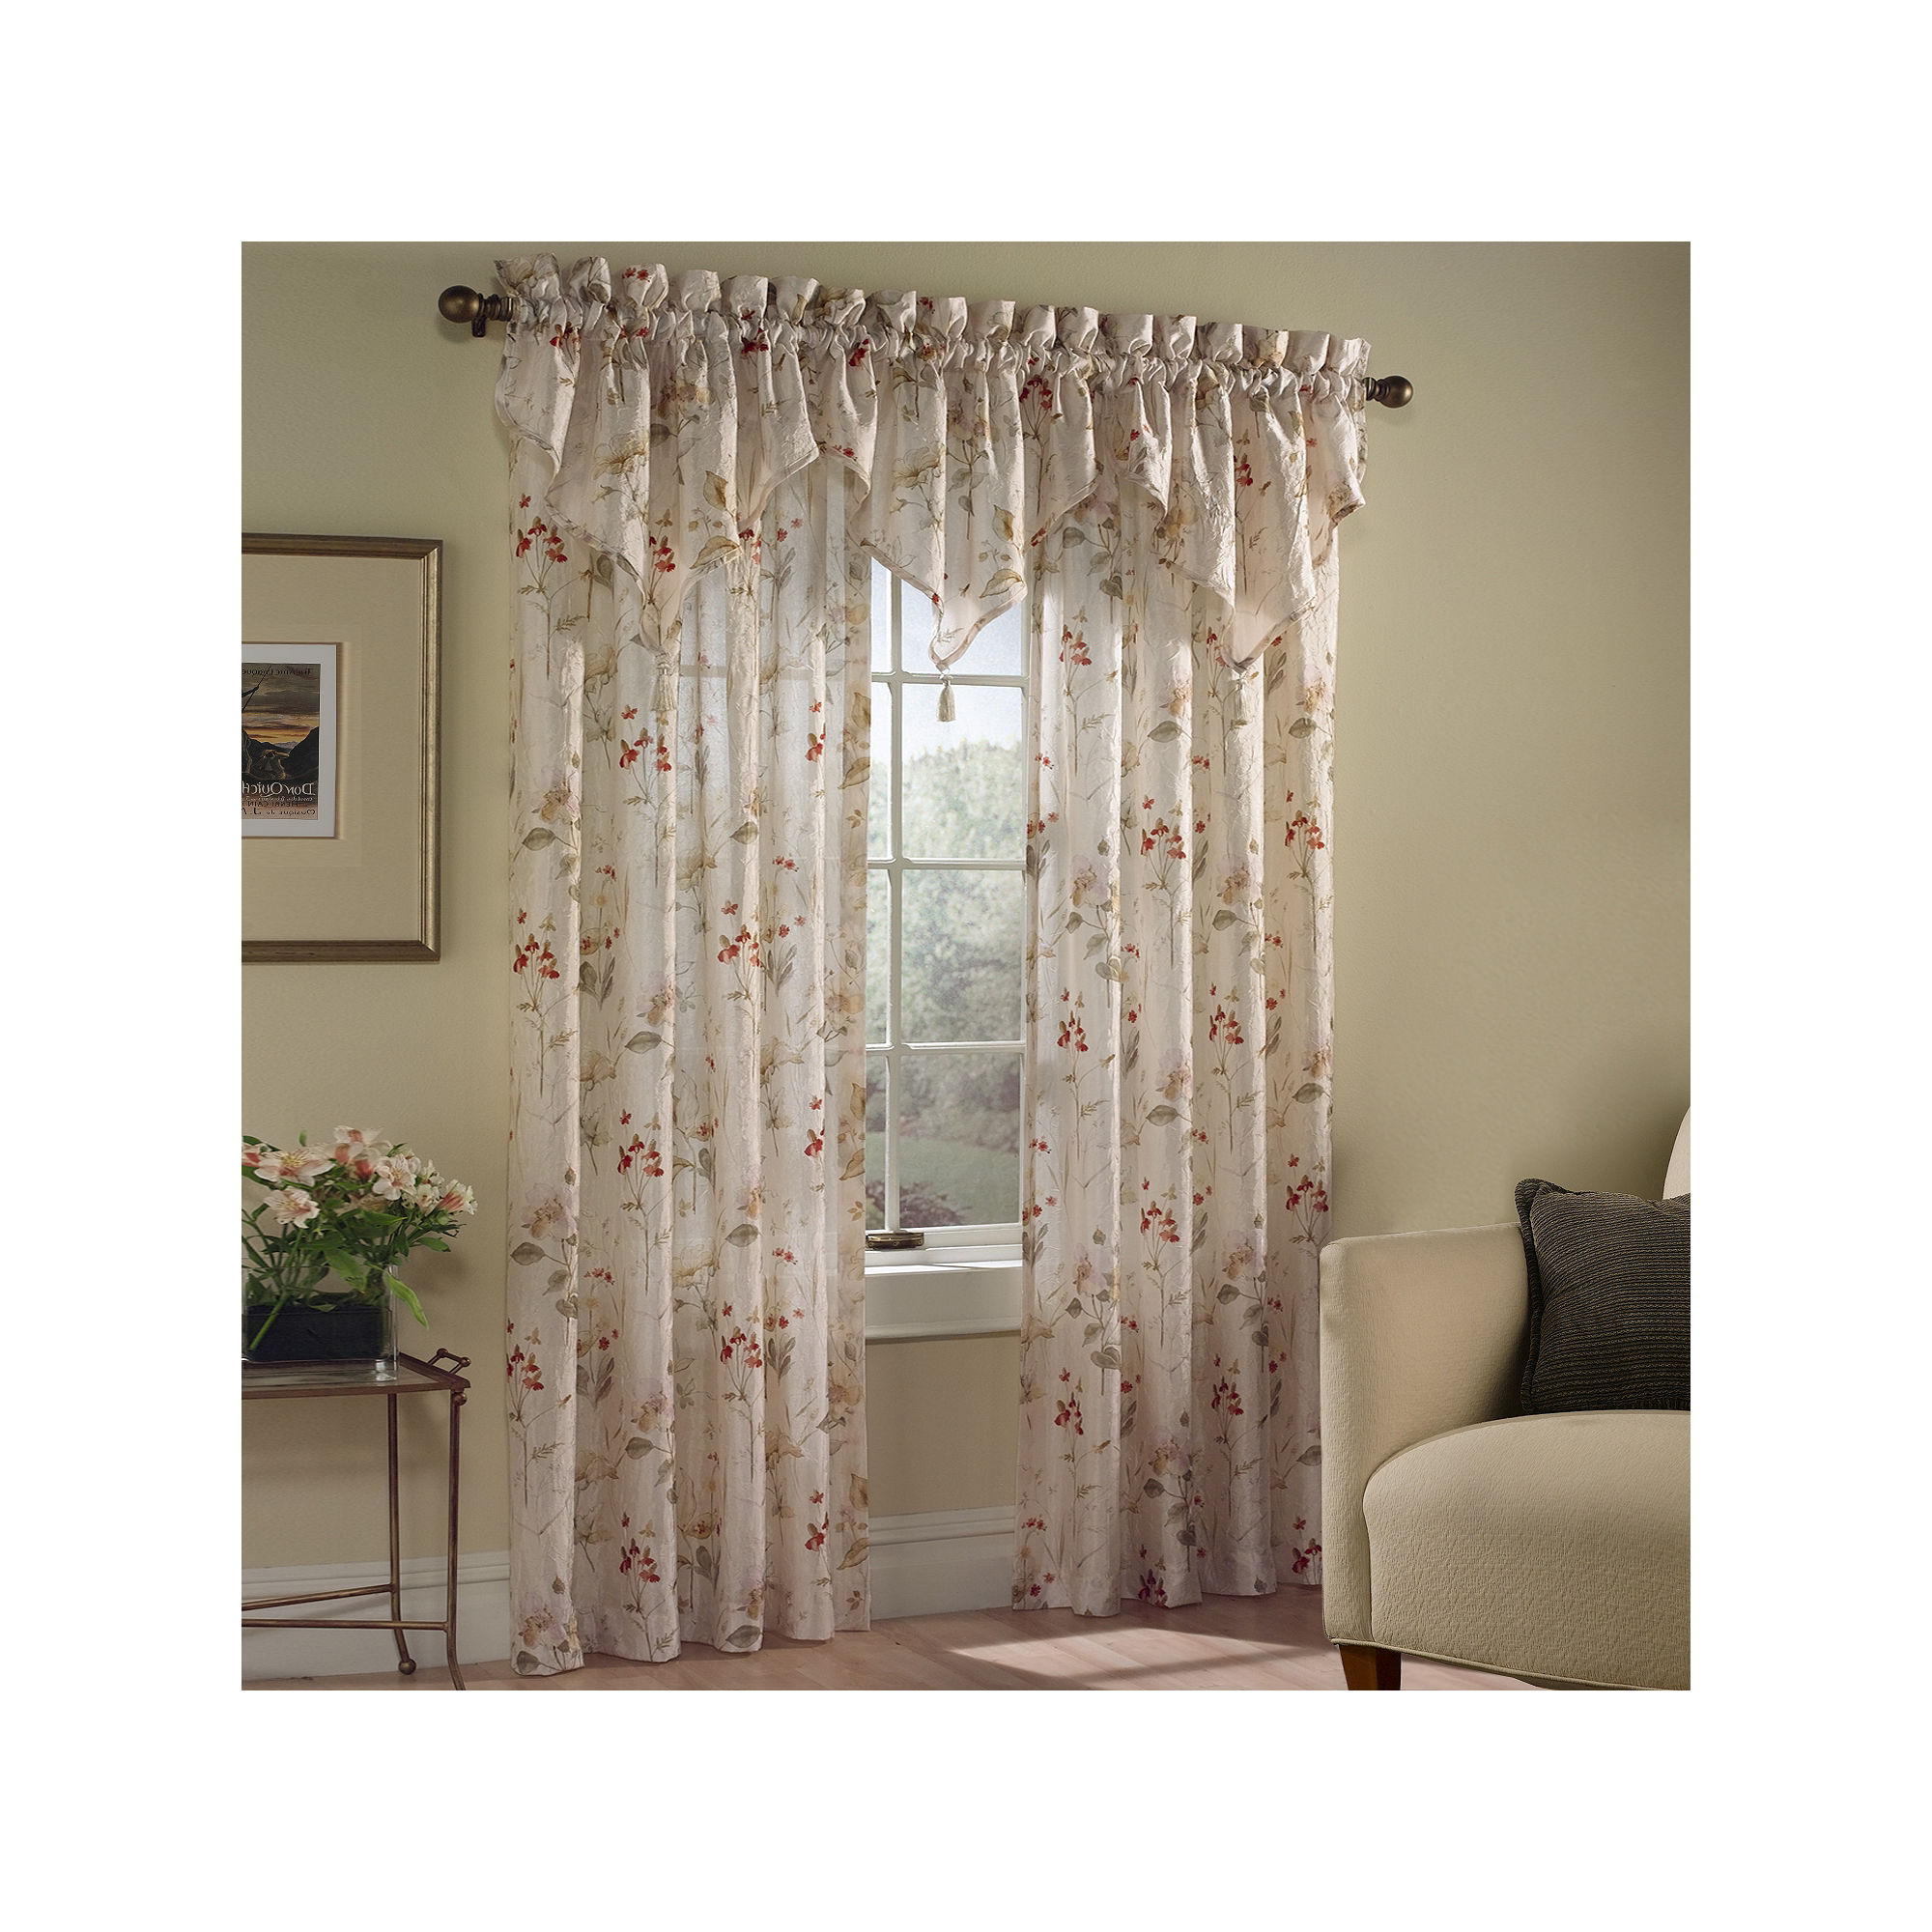 021371008518 Upc United Curtain Co Chantelle Window